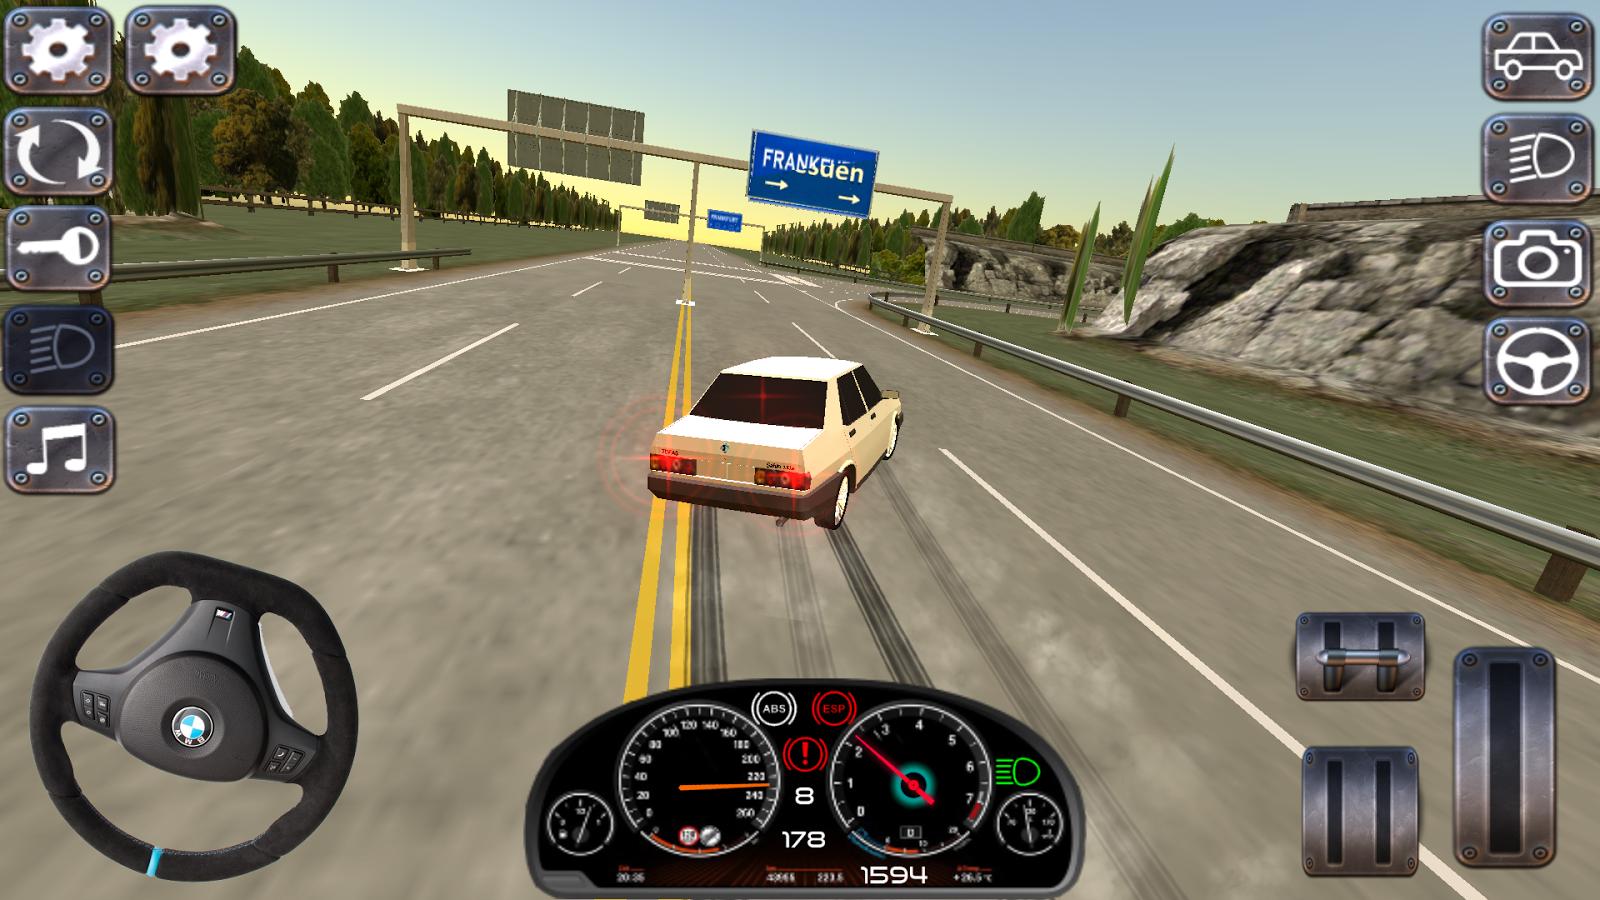 Car Simulator Games >> Car Simulator Game 2016 App Ranking And Store Data App Annie